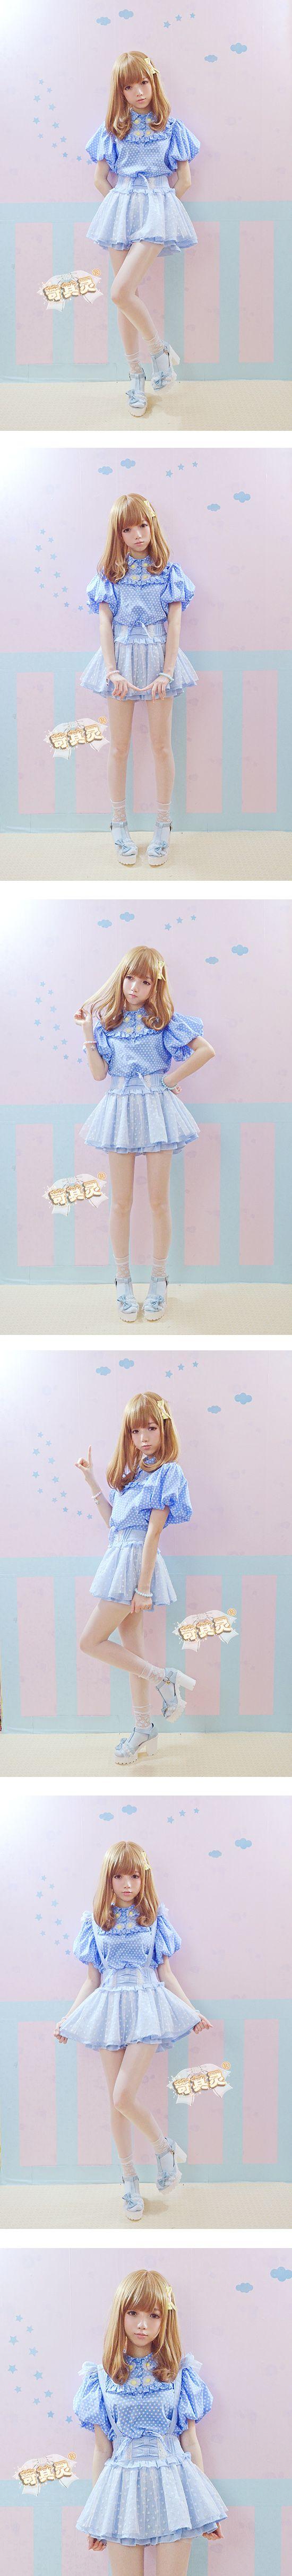 Exclusive girls school uniforms girls harsh harsh summer Feifei sleeve bow skirt tutu skirt overalls - Taobao